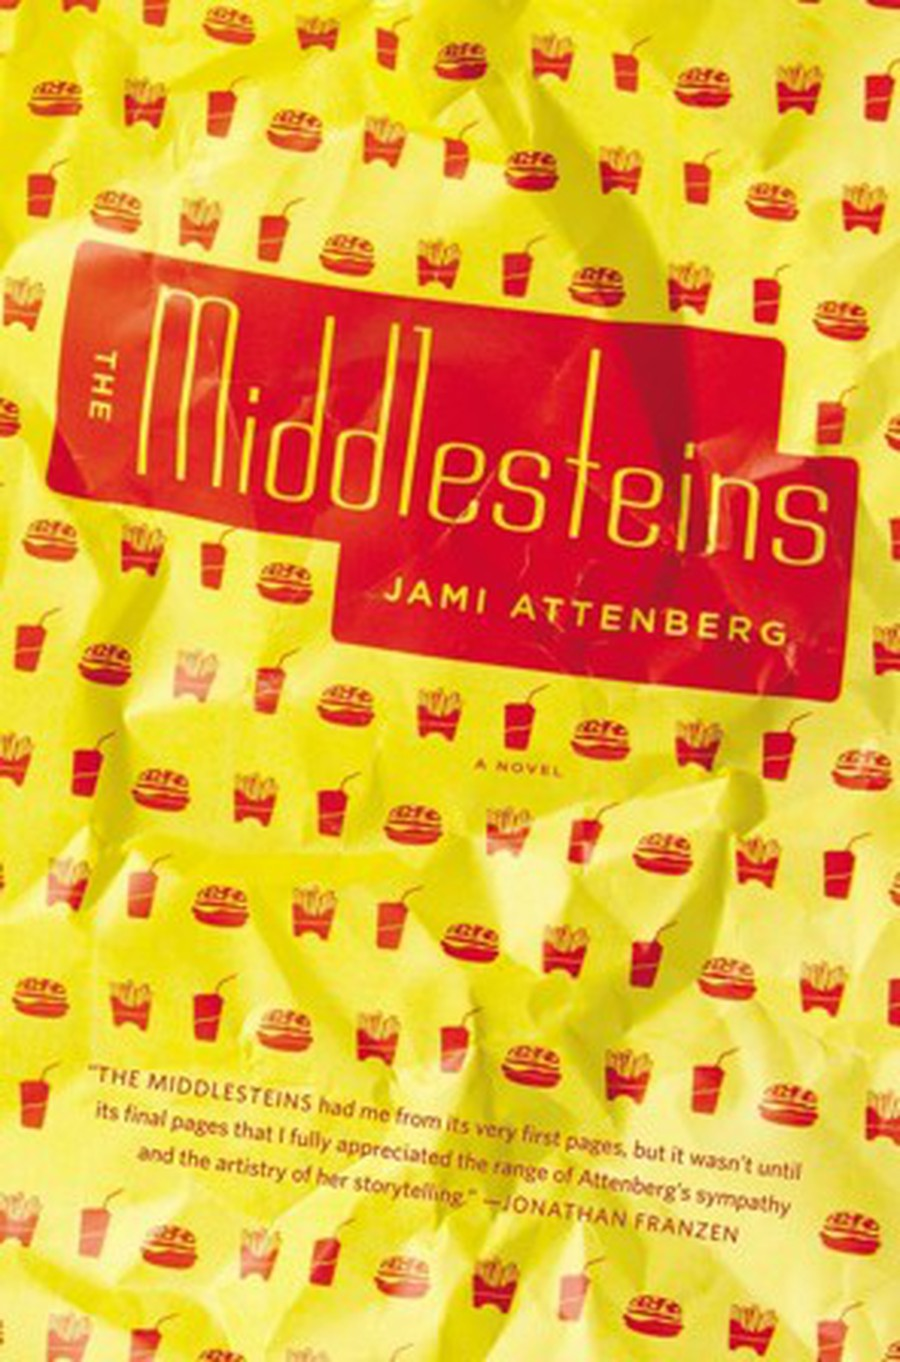 Jami Attenberg's new novel The Middlesteins involves Jews, jokes, hamburgers, and fries.